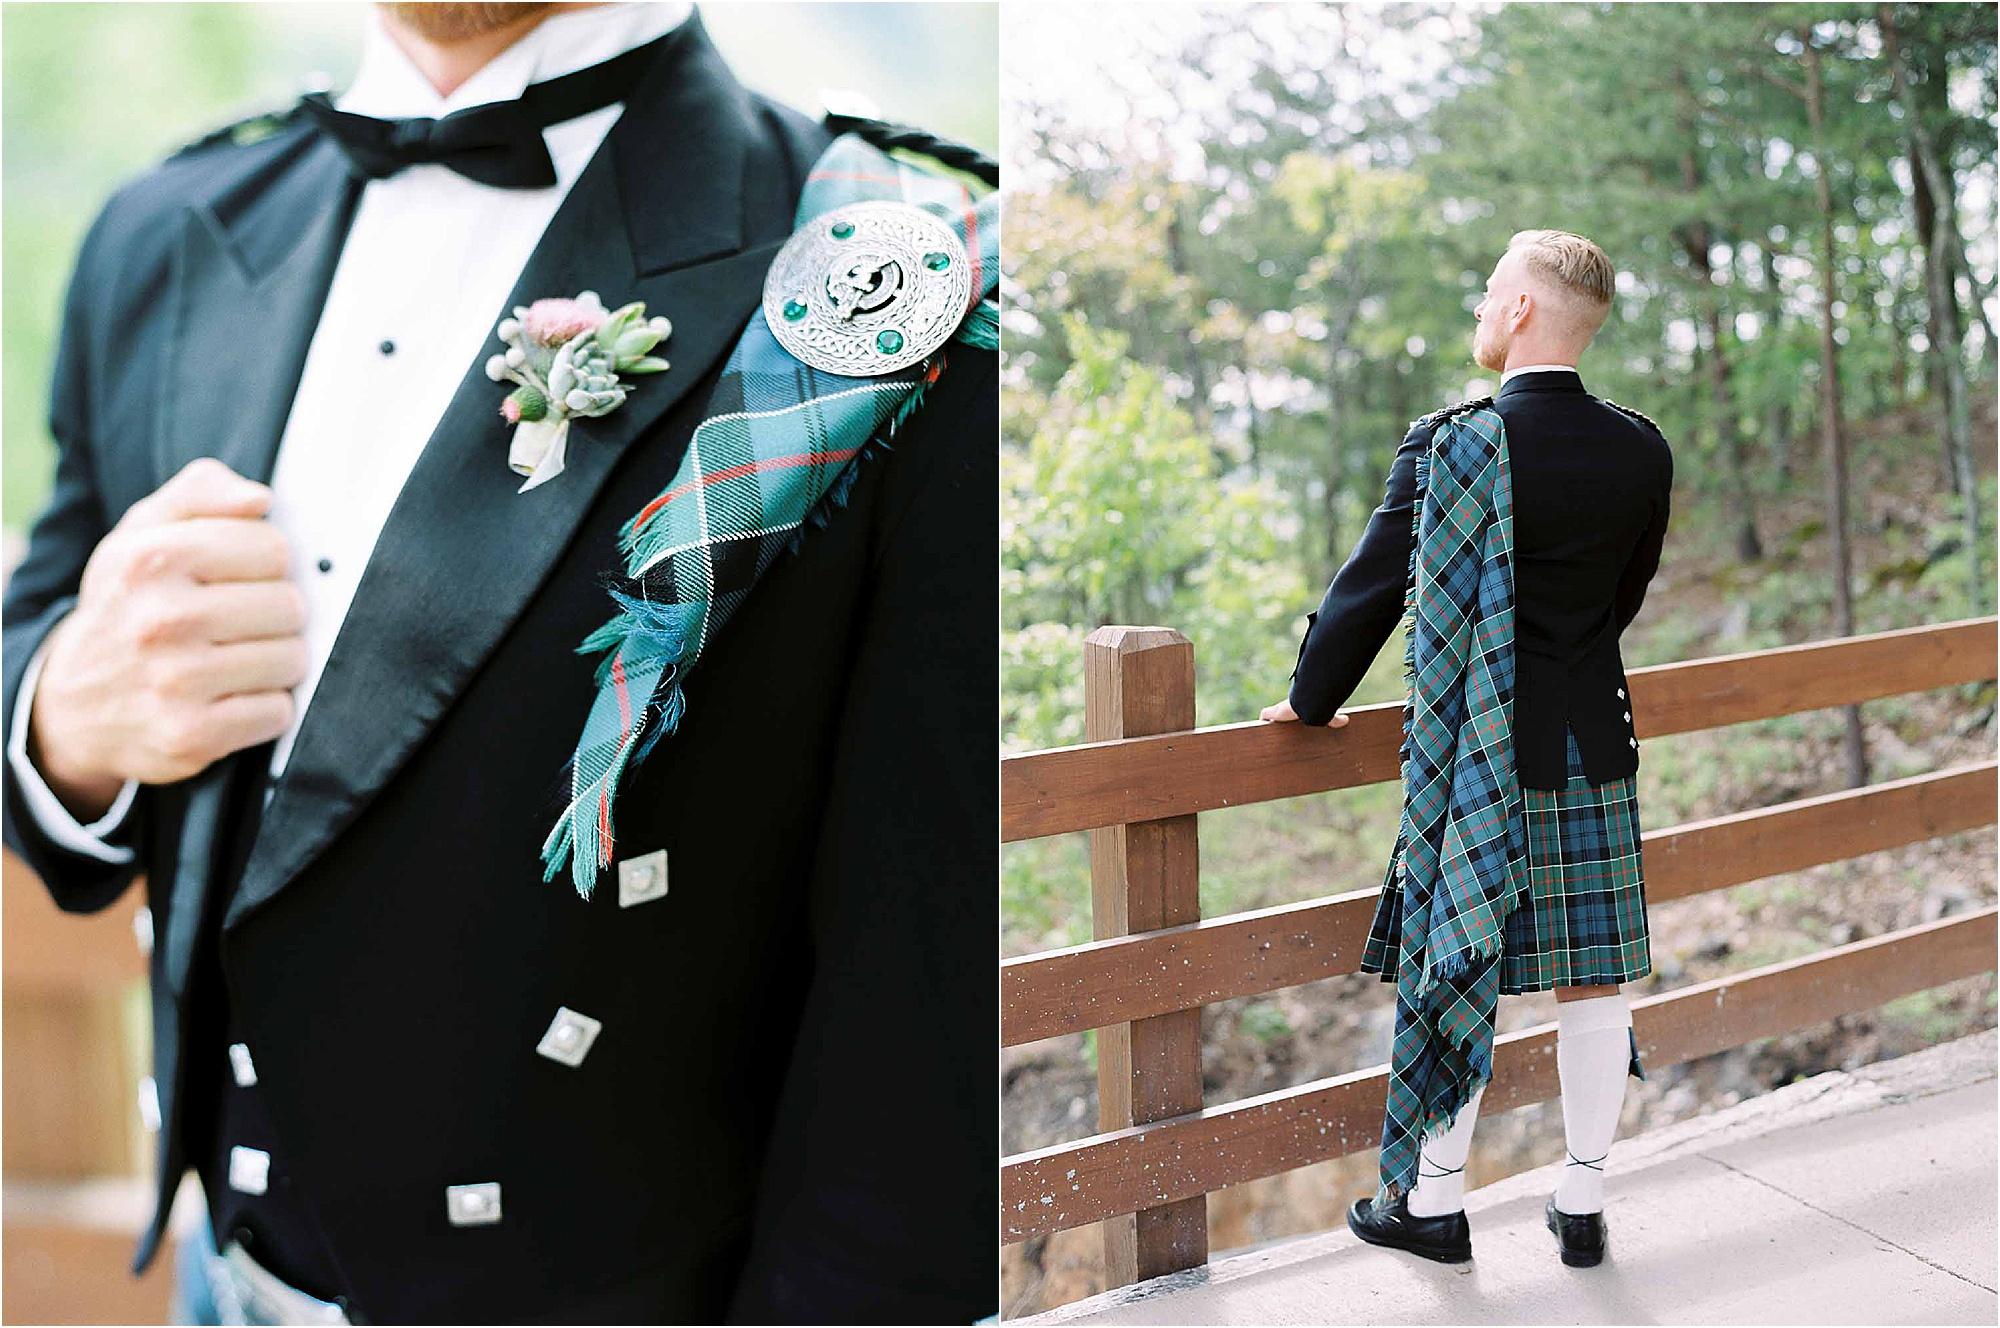 Scottish details on groom at wedding